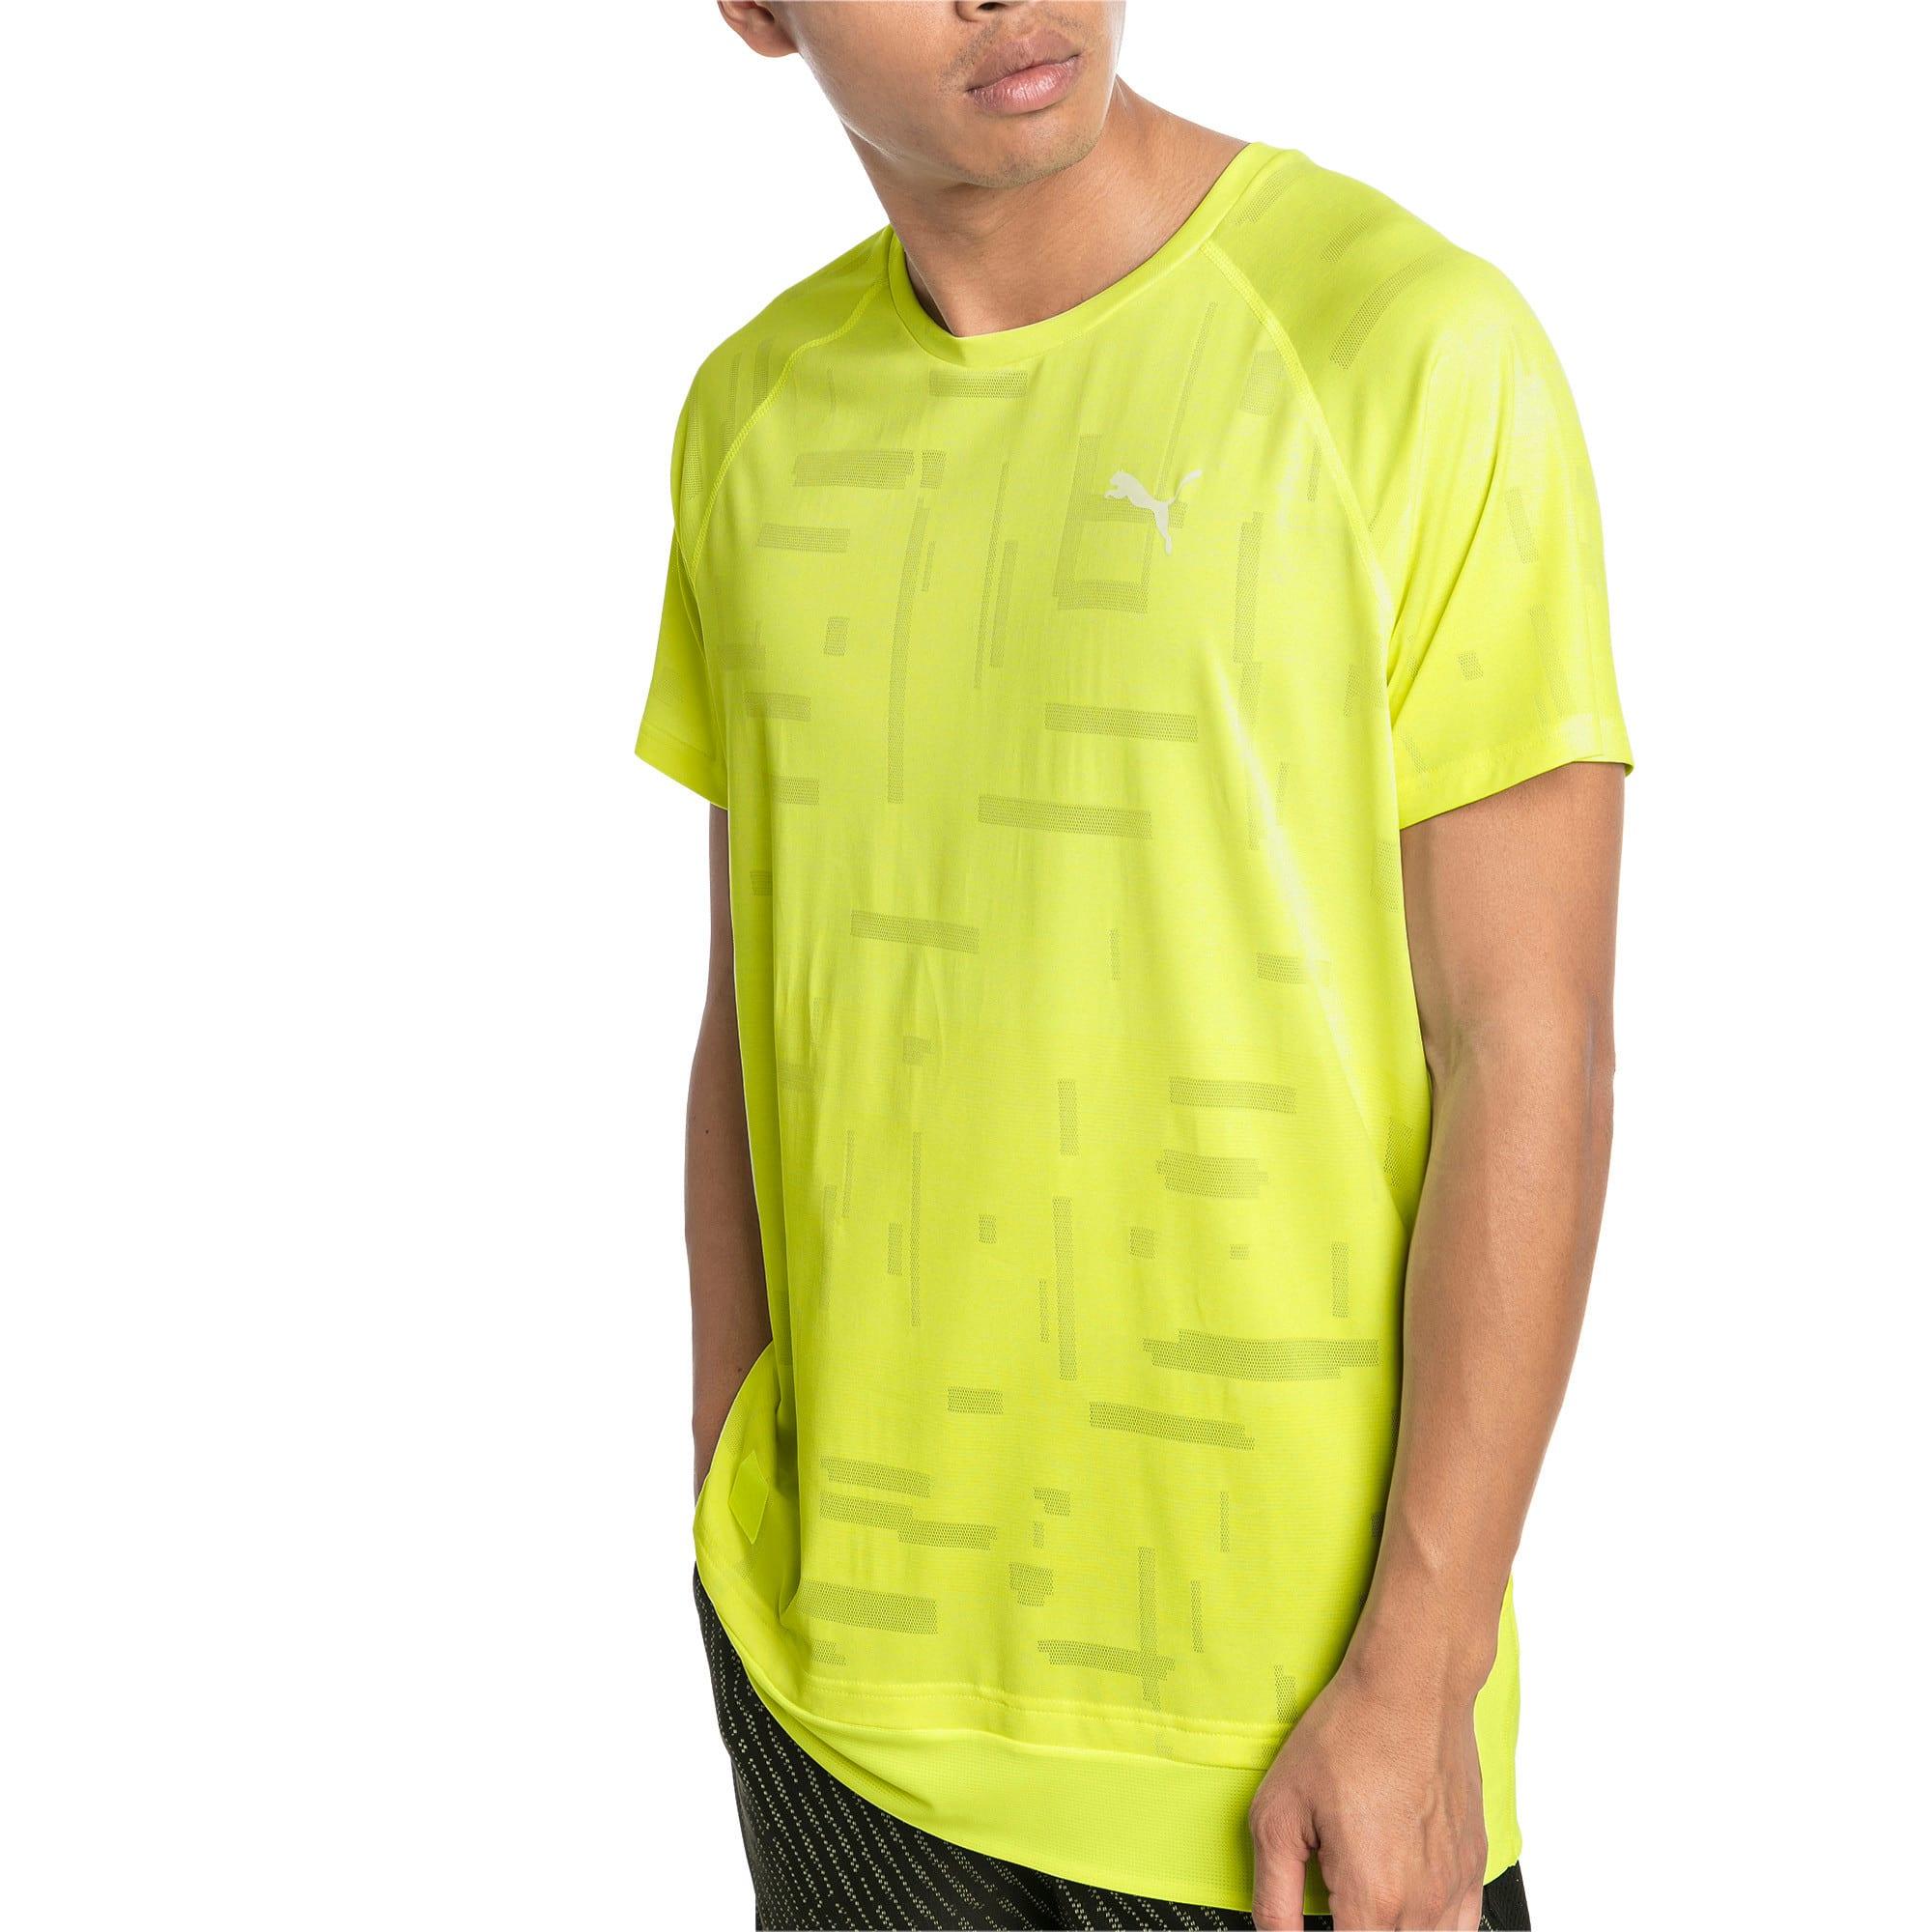 Thumbnail 1 of T-Shirt Energy Tech Training pour homme, Fizzy Yellow, medium